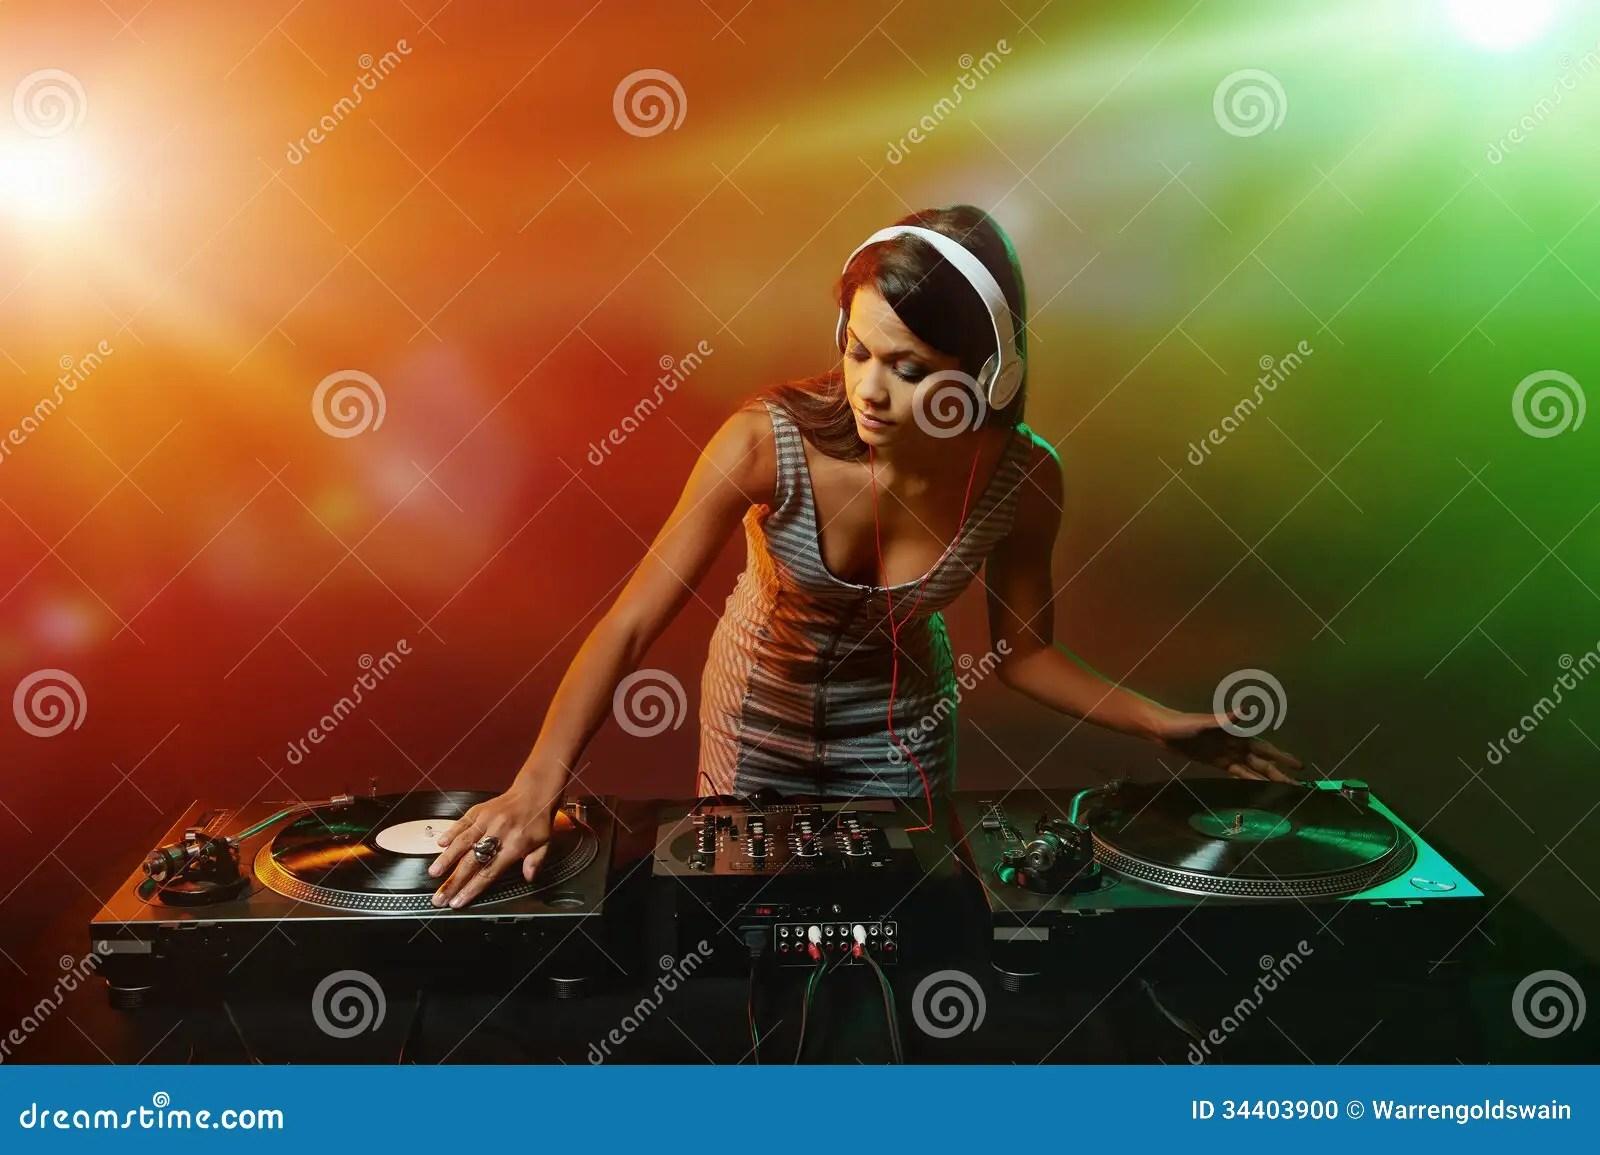 Victoria Falls Wallpaper Music Dj Woman Stock Photo Image 34403900